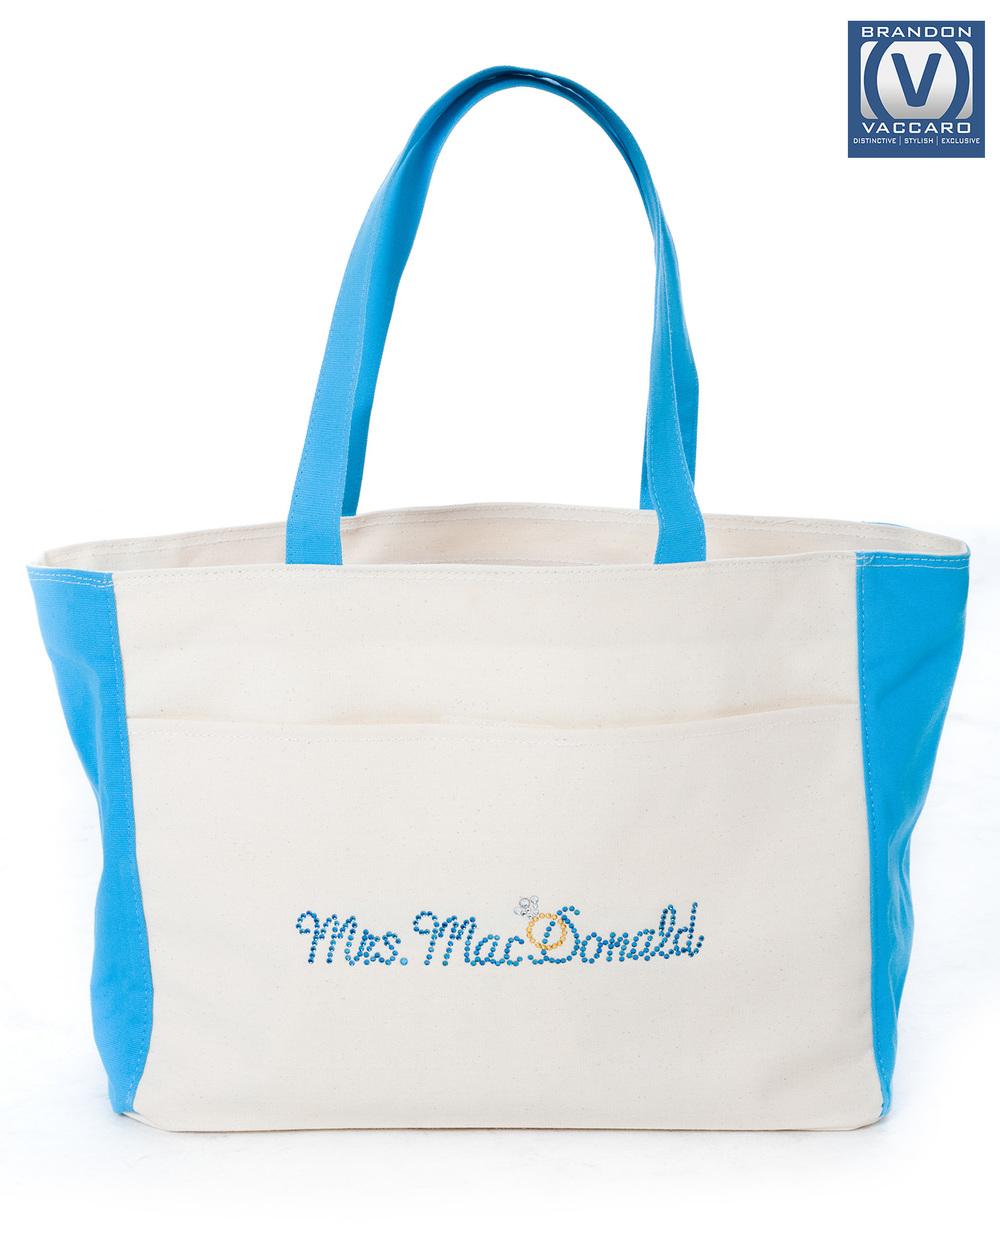 Product MyBridalBling.com